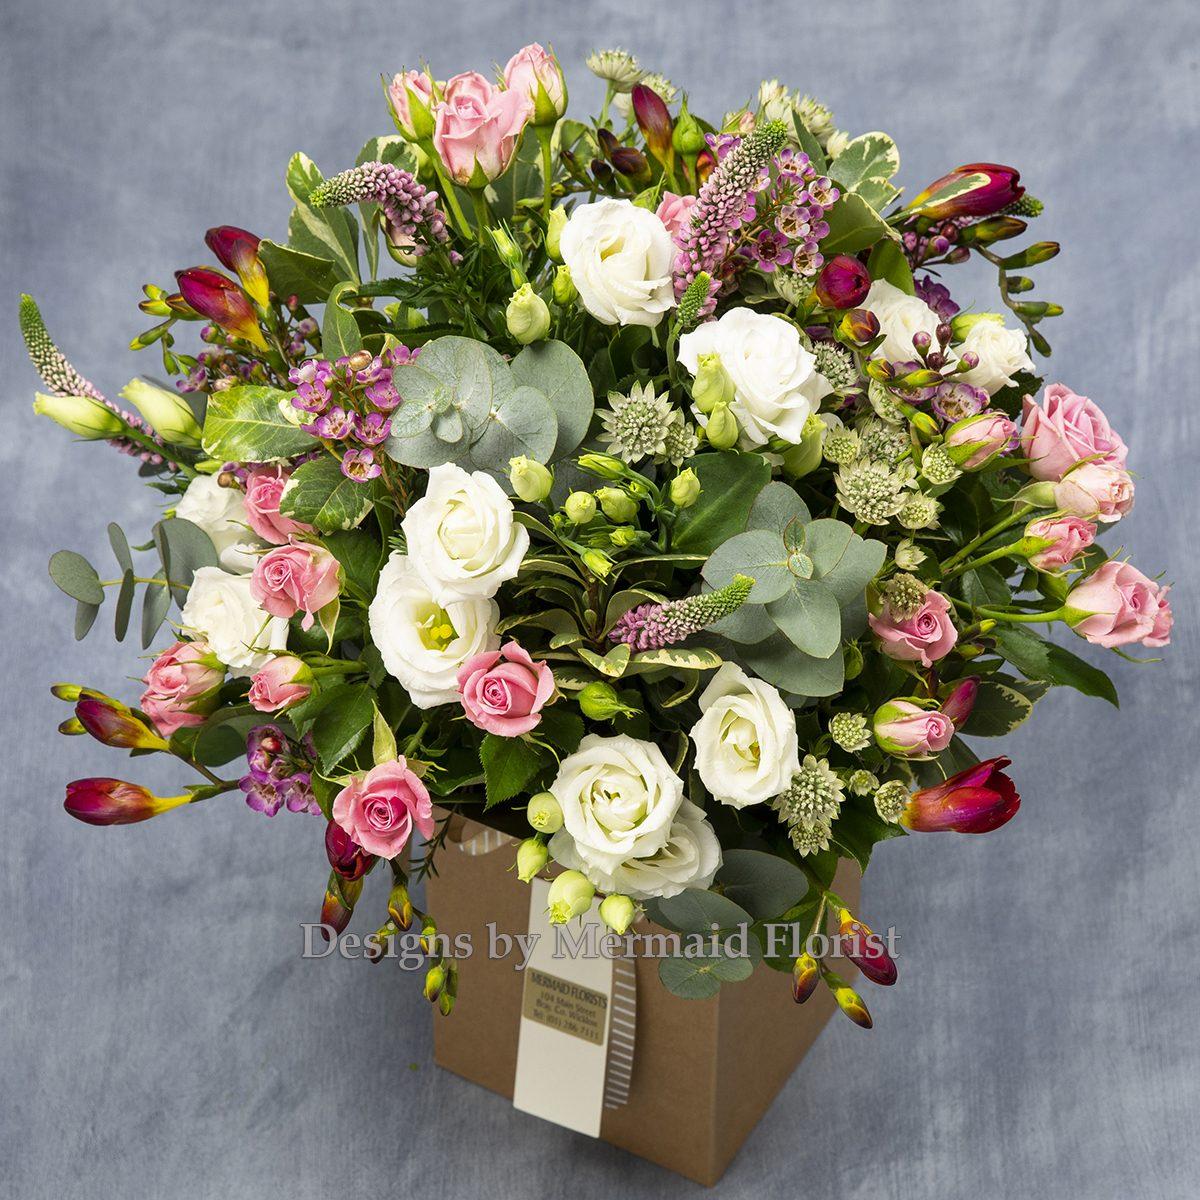 Ranalagh Roses